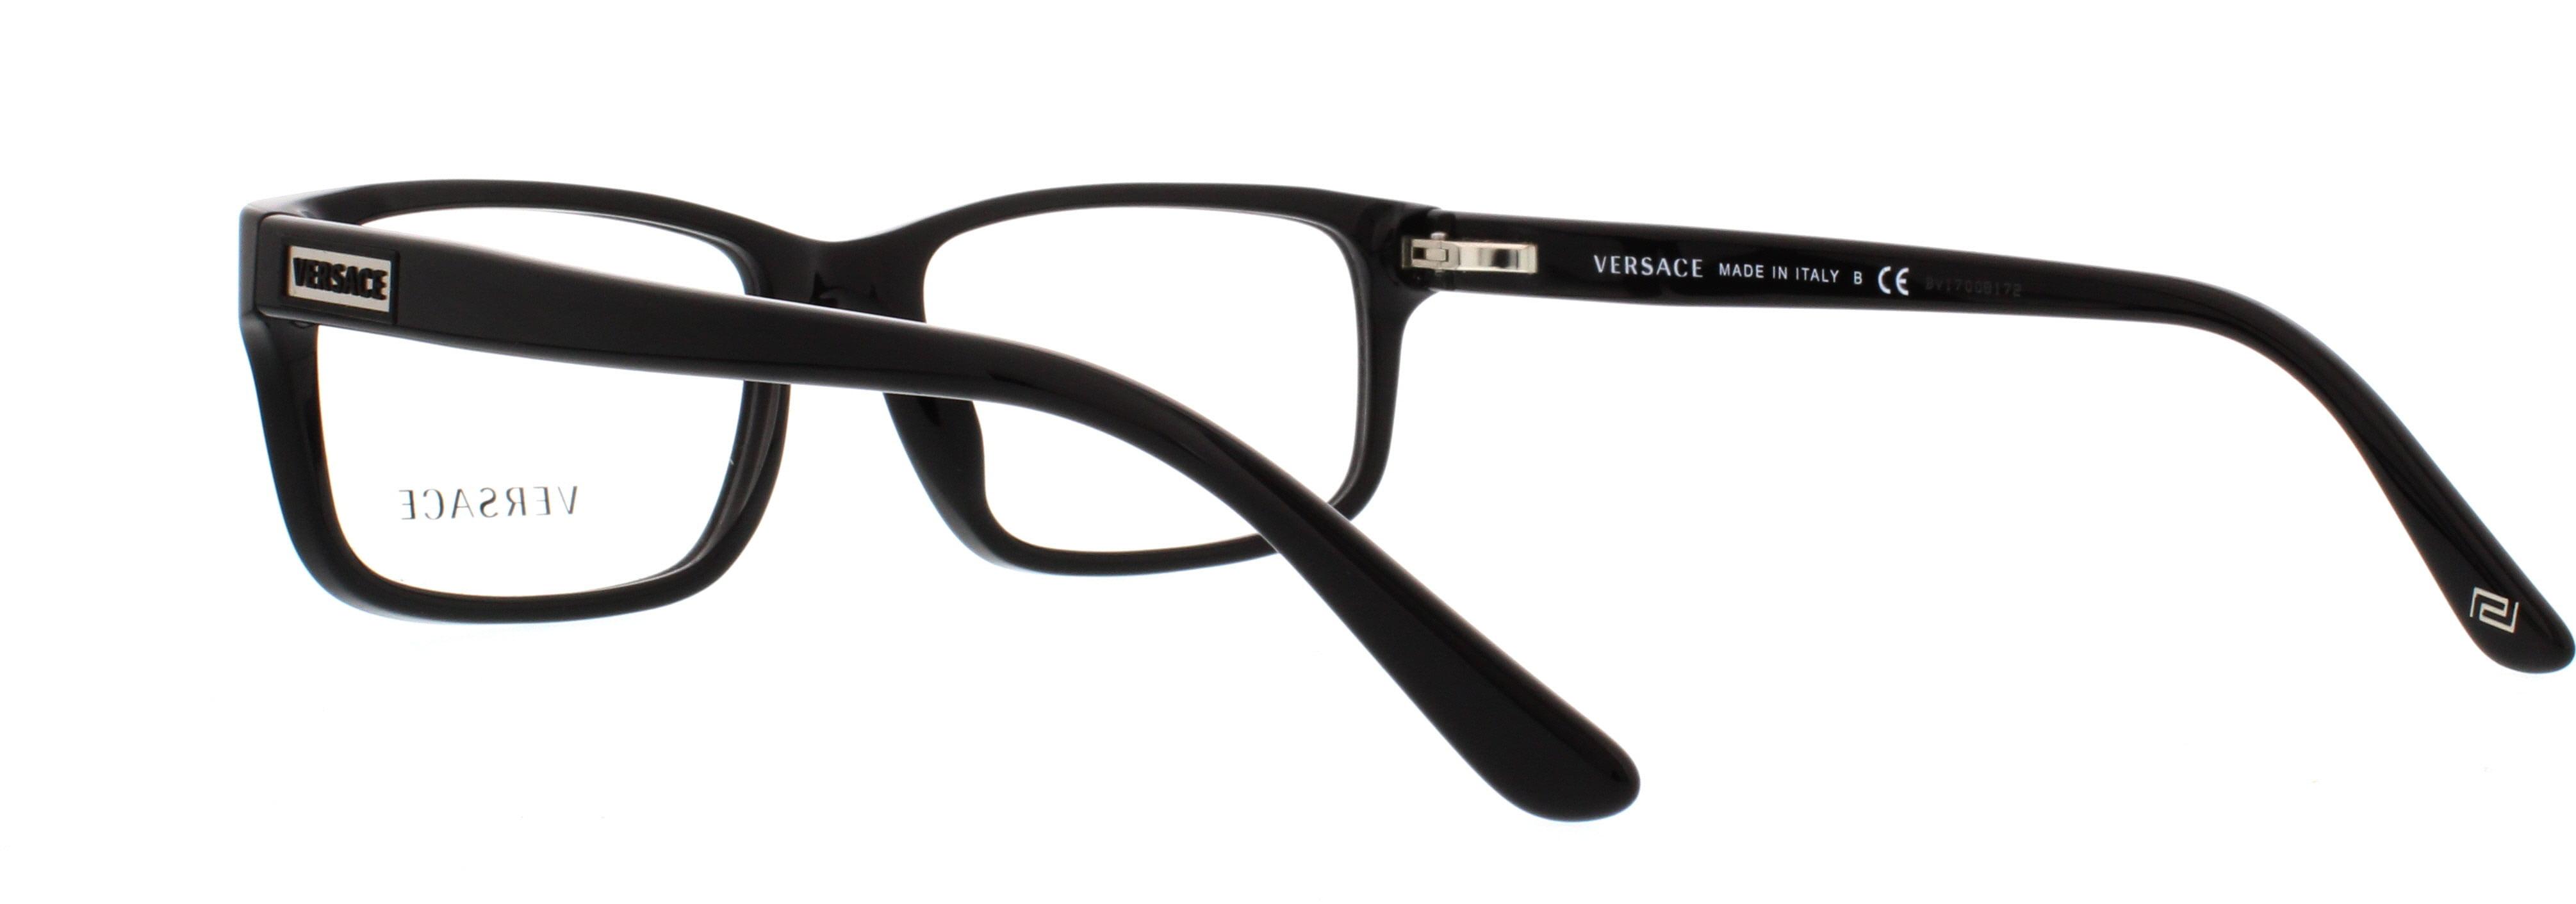 79fdf2c48d2 VERSACE Eyeglasses VE3154 GB1 Black 54MM - Walmart.com